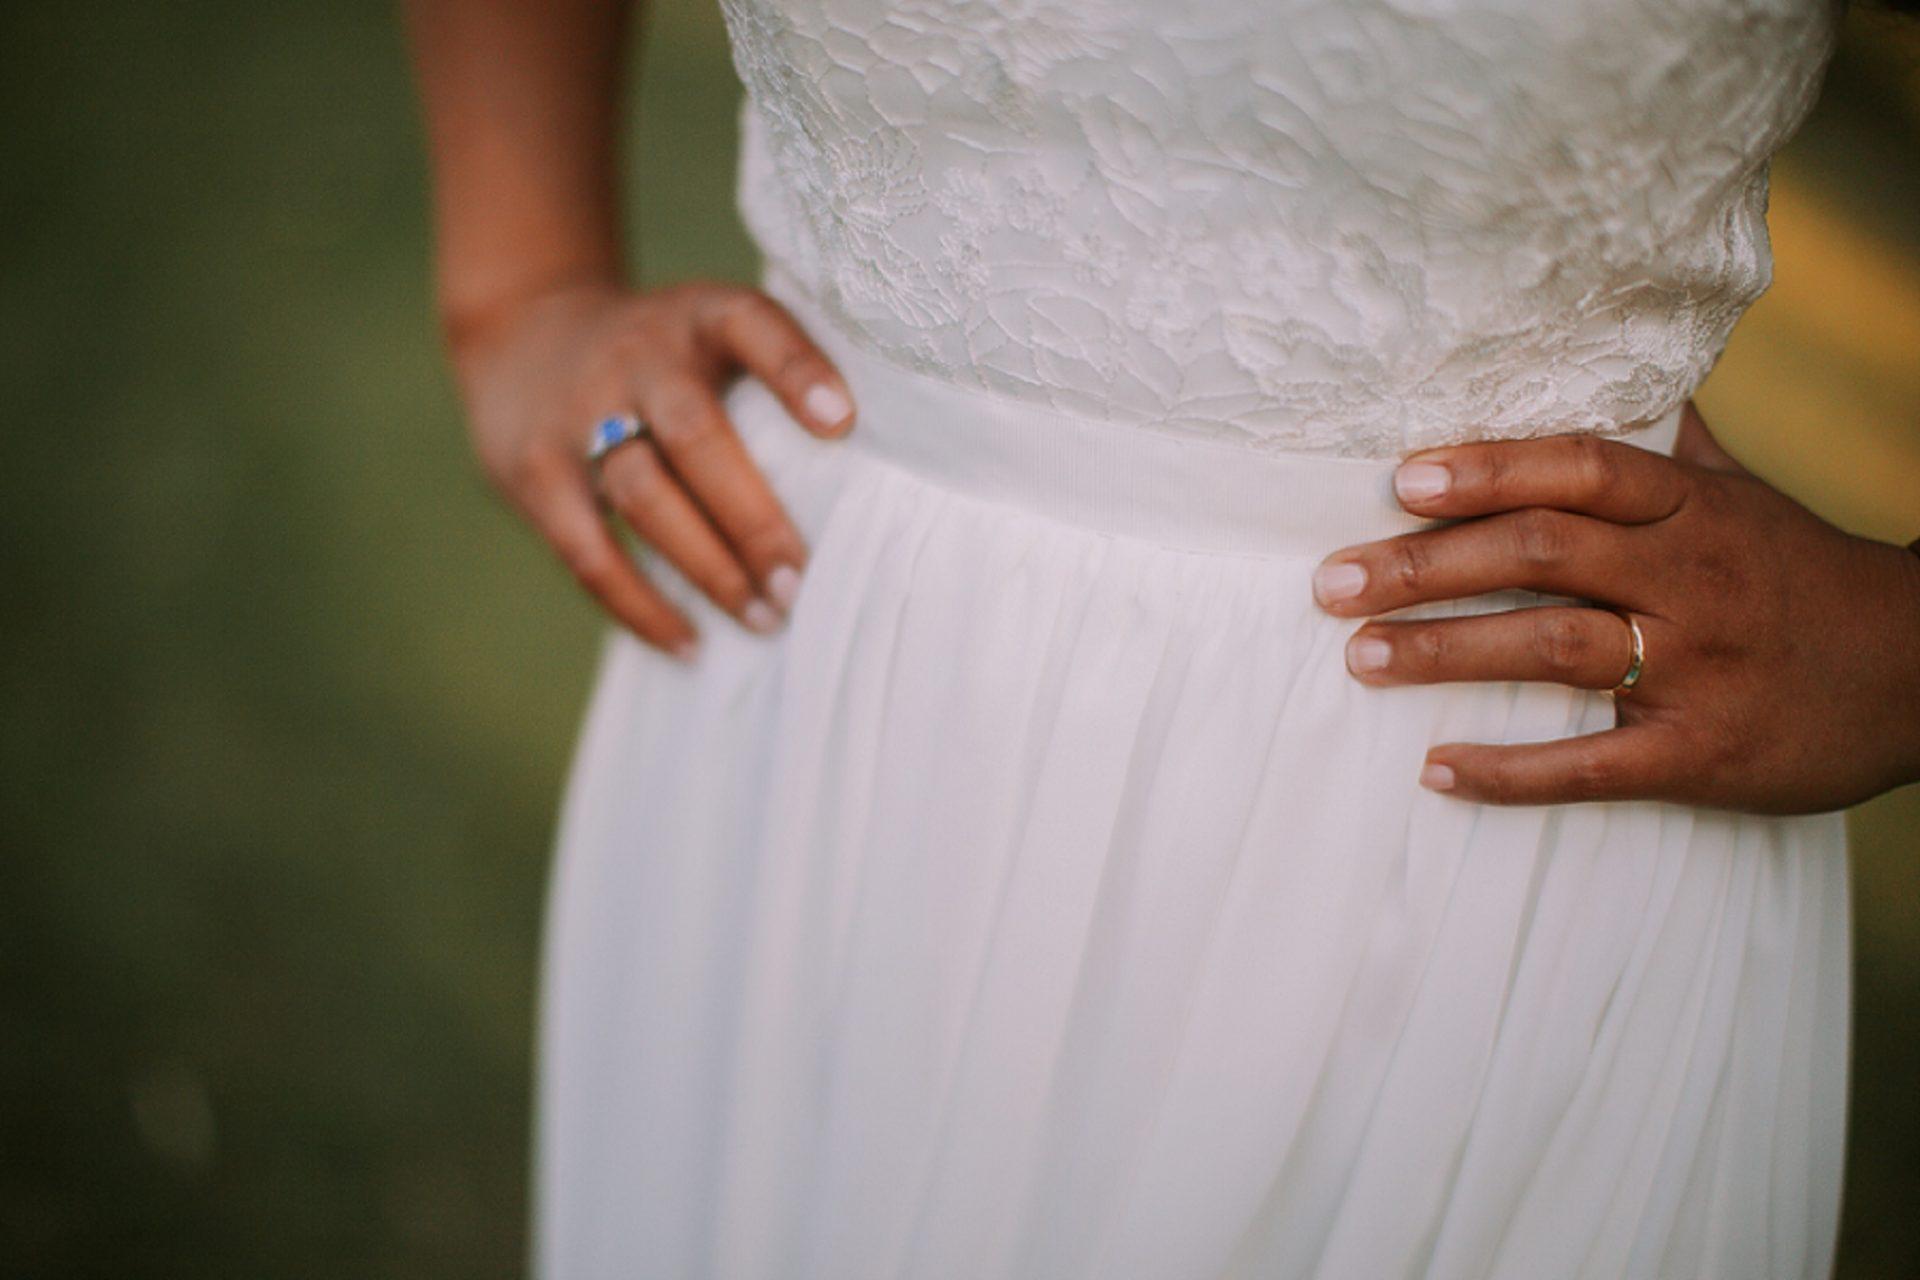 katerynaphotos-mariage-photographe-puyloubier-provence-aix-en-provence-sud-de-la-france_0433.jpg